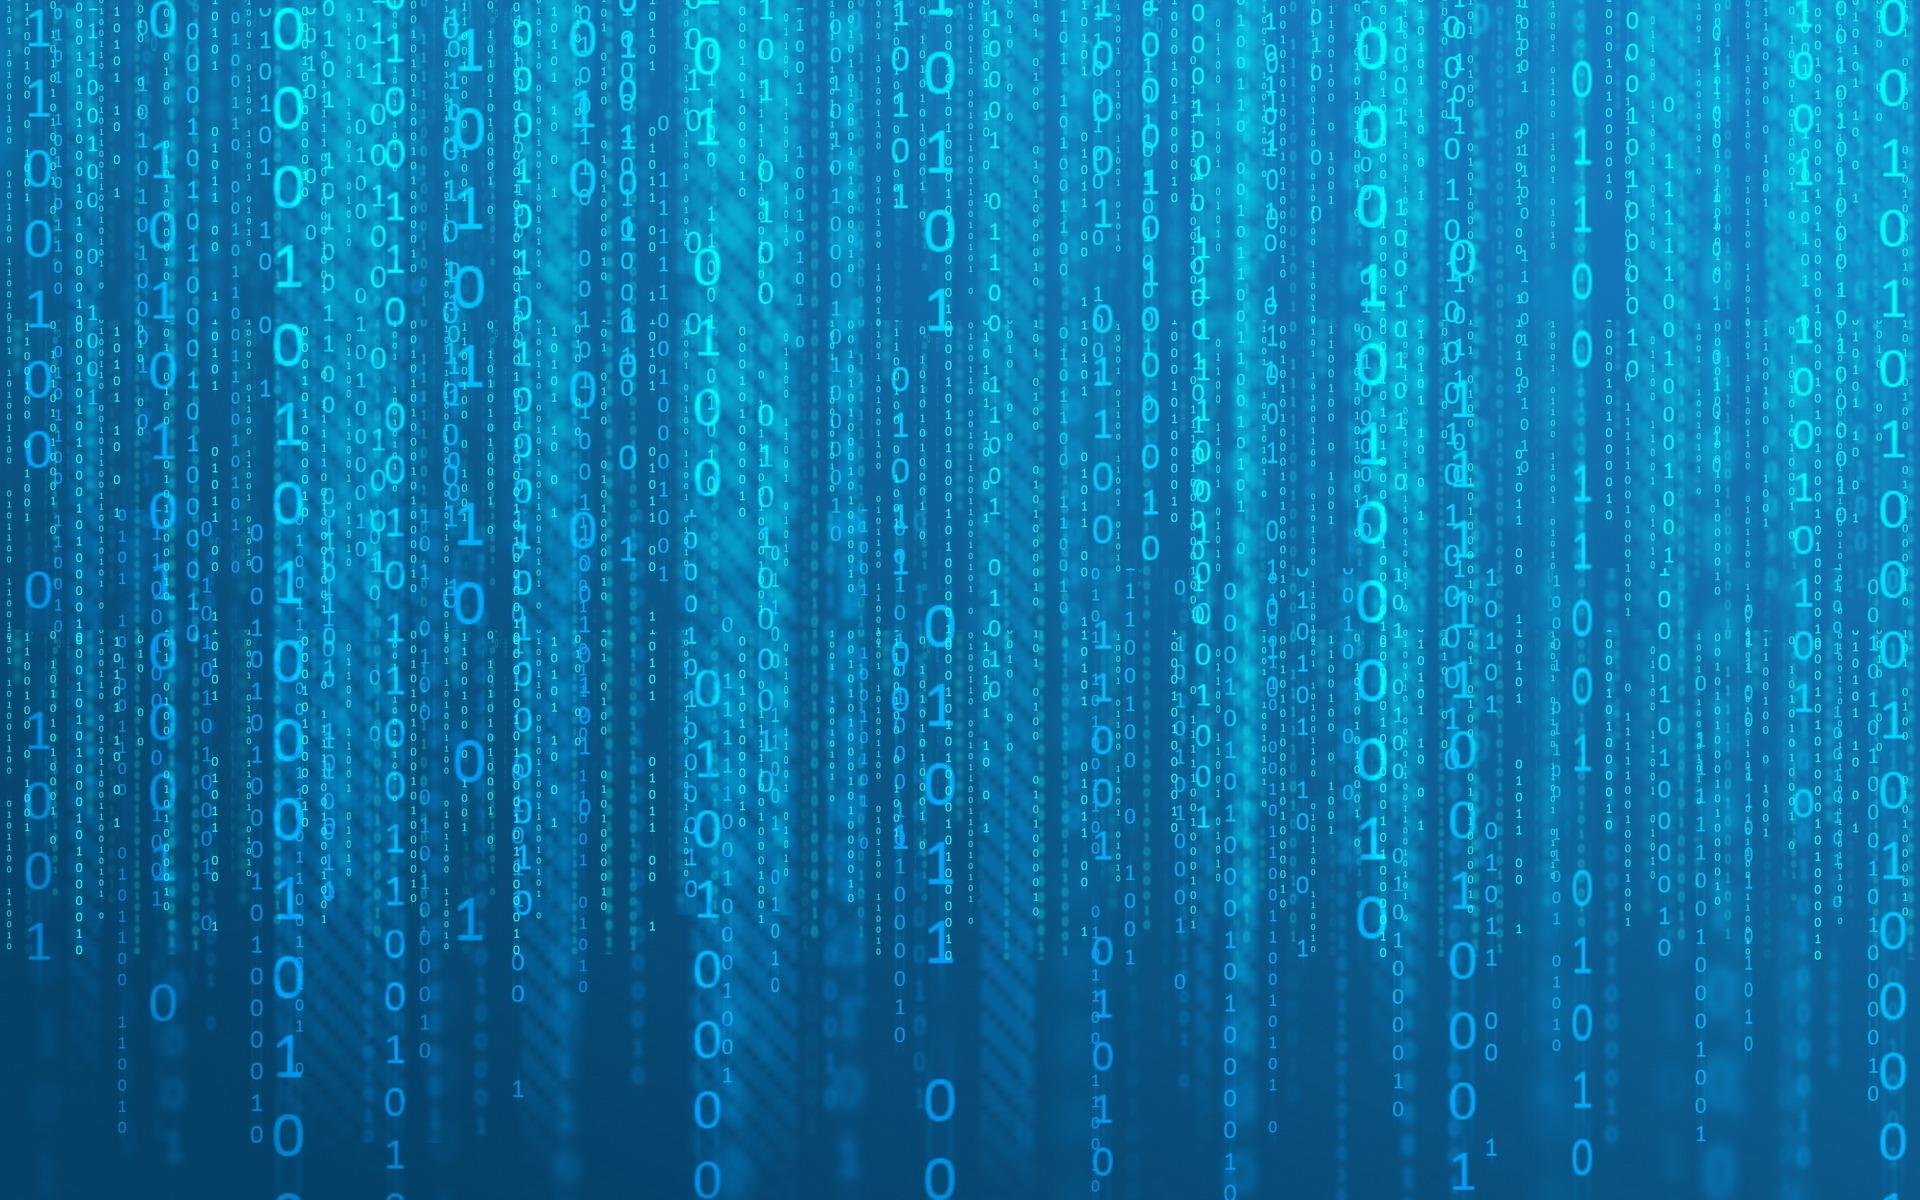 Matrix Binary Wallpapers HD Wallpapers 1920x1200